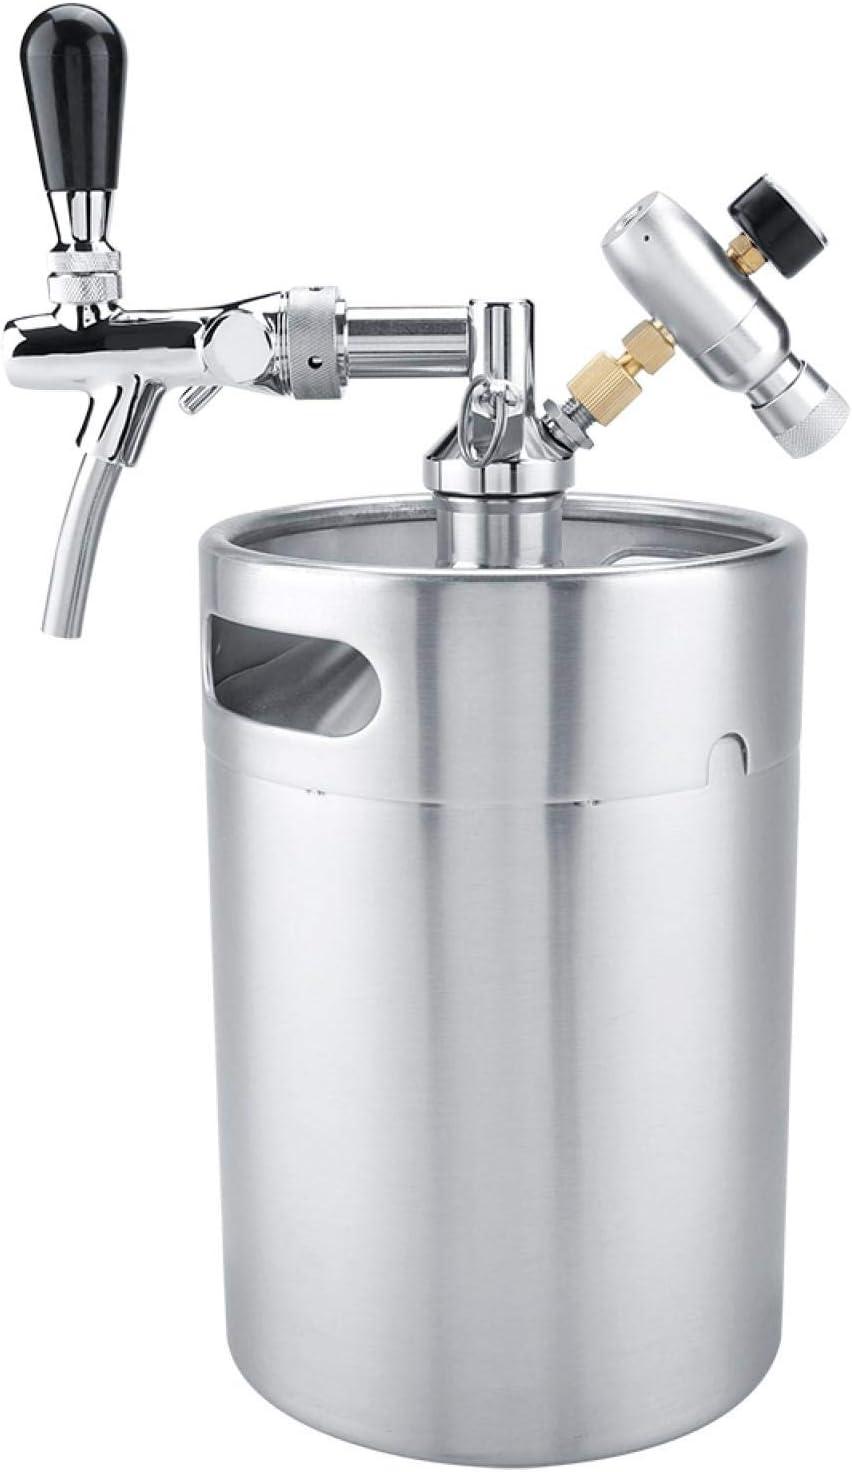 Mini barril de acero inoxidable de 5L con grifo Juego de dispensador de cerveza artesanal presurizado para elaboración de cerveza, barril de cerveza Mini barril dispensador de barril de cerveza inoxid